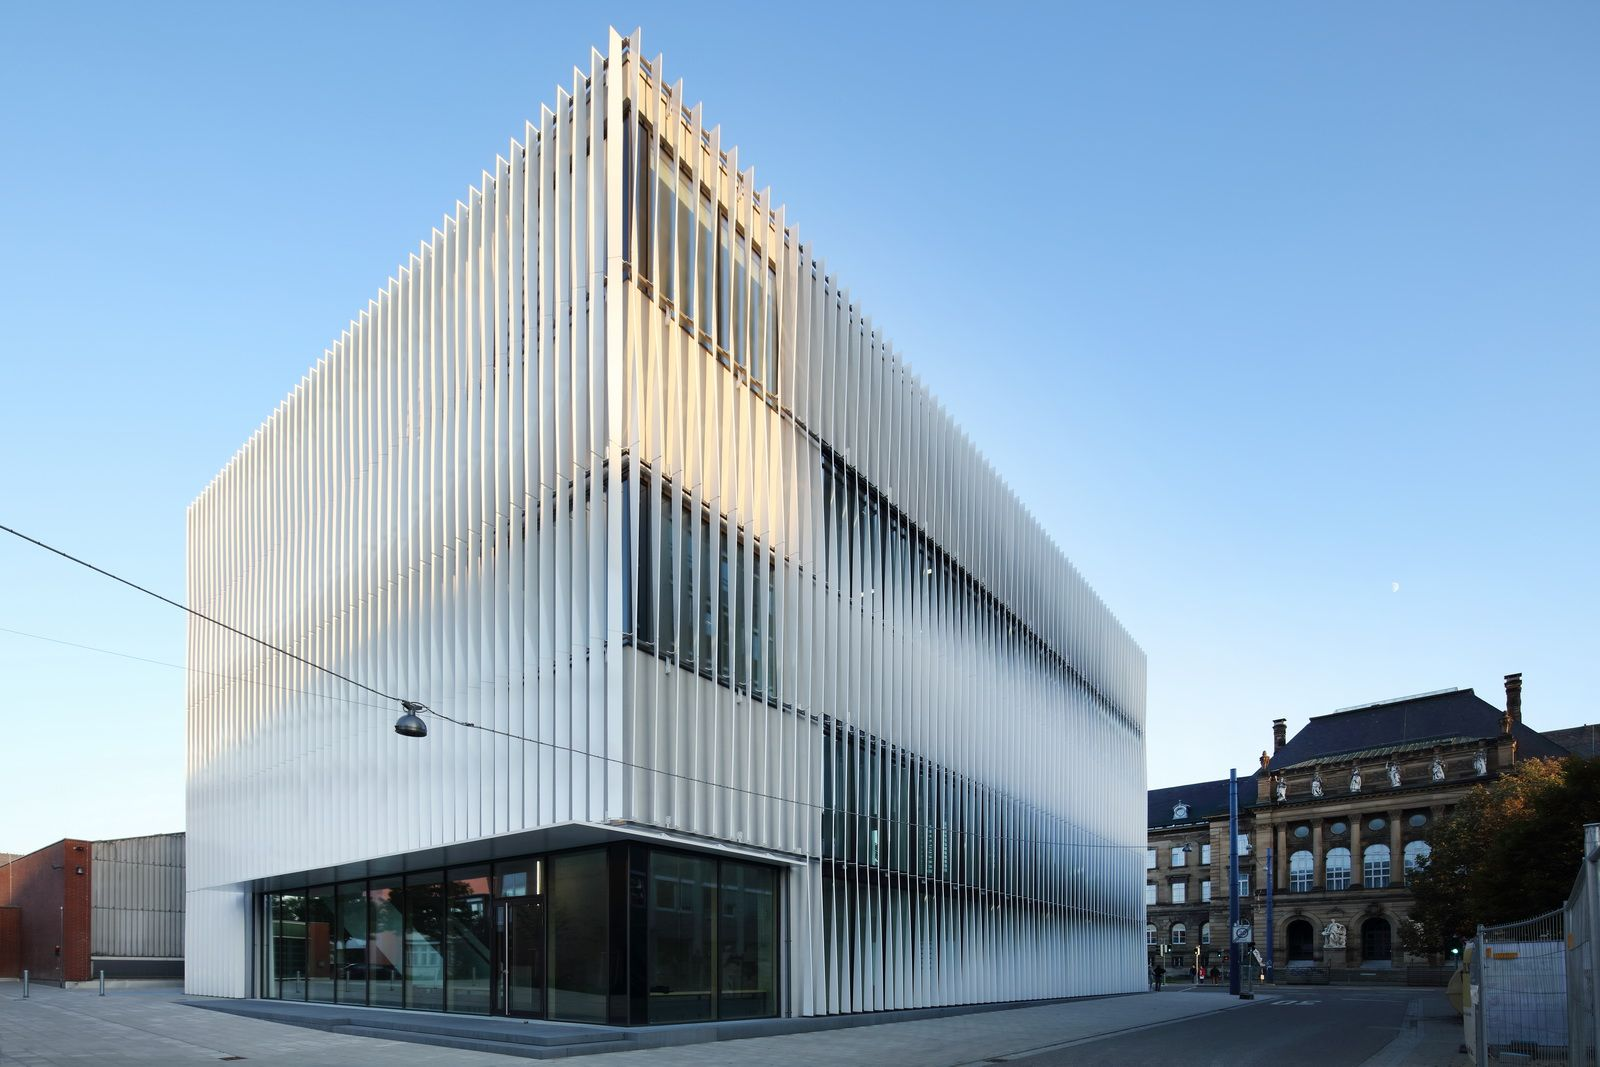 A Curtain-like Facade in Ulm